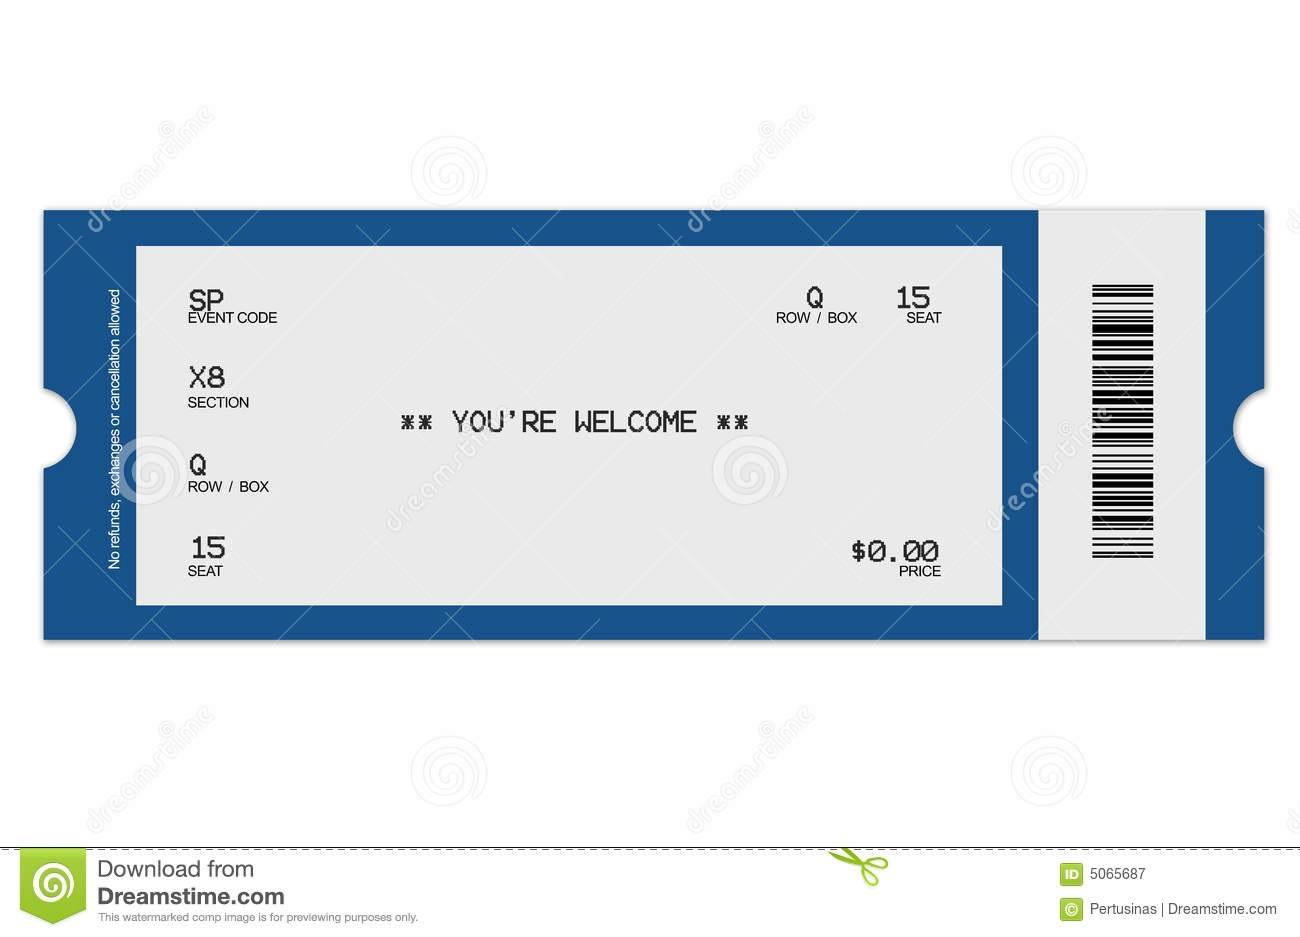 006 Sensational Free Fake Concert Ticket Template High Def Full